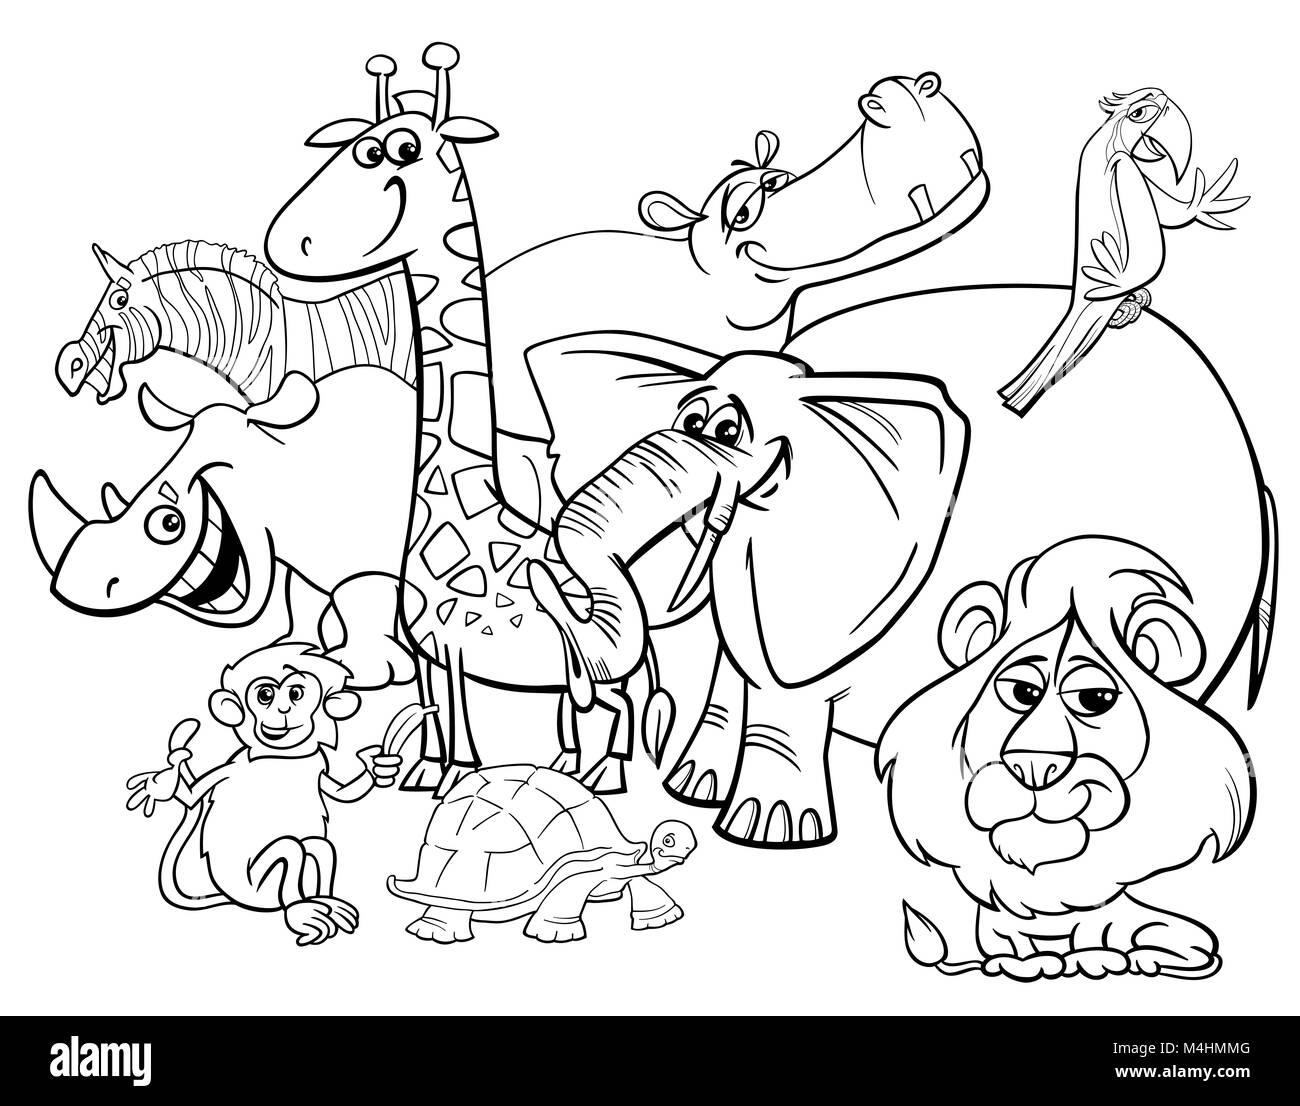 cartoon safari animals coloring page Stock Photo ...